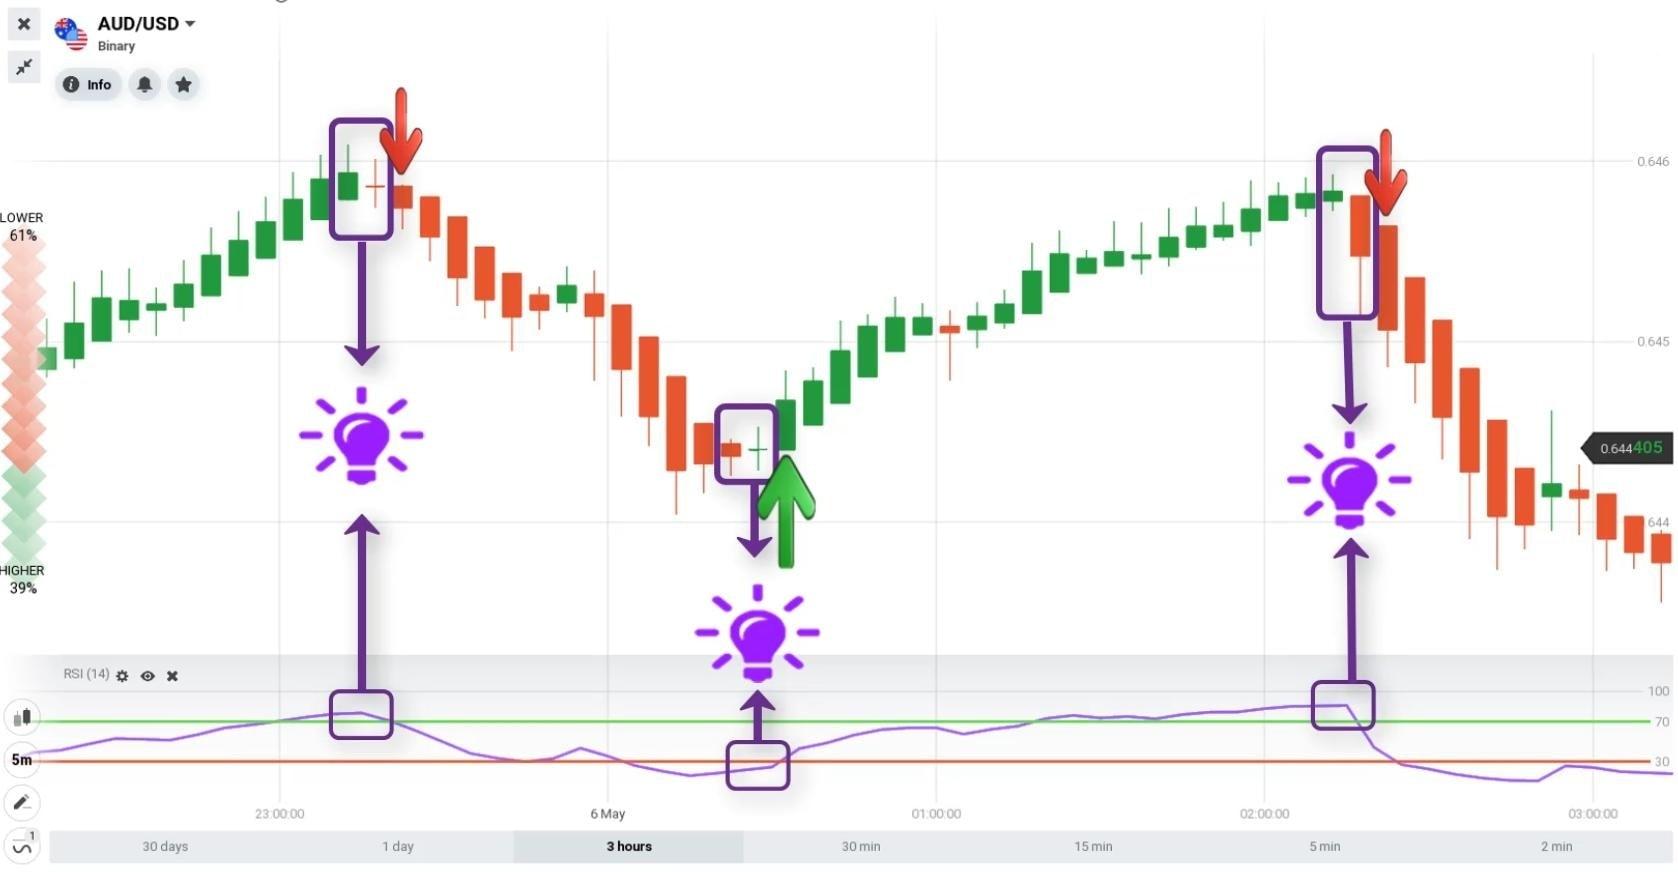 Grafik Heikin Ashi dikombinasikan dengan indikator RSI